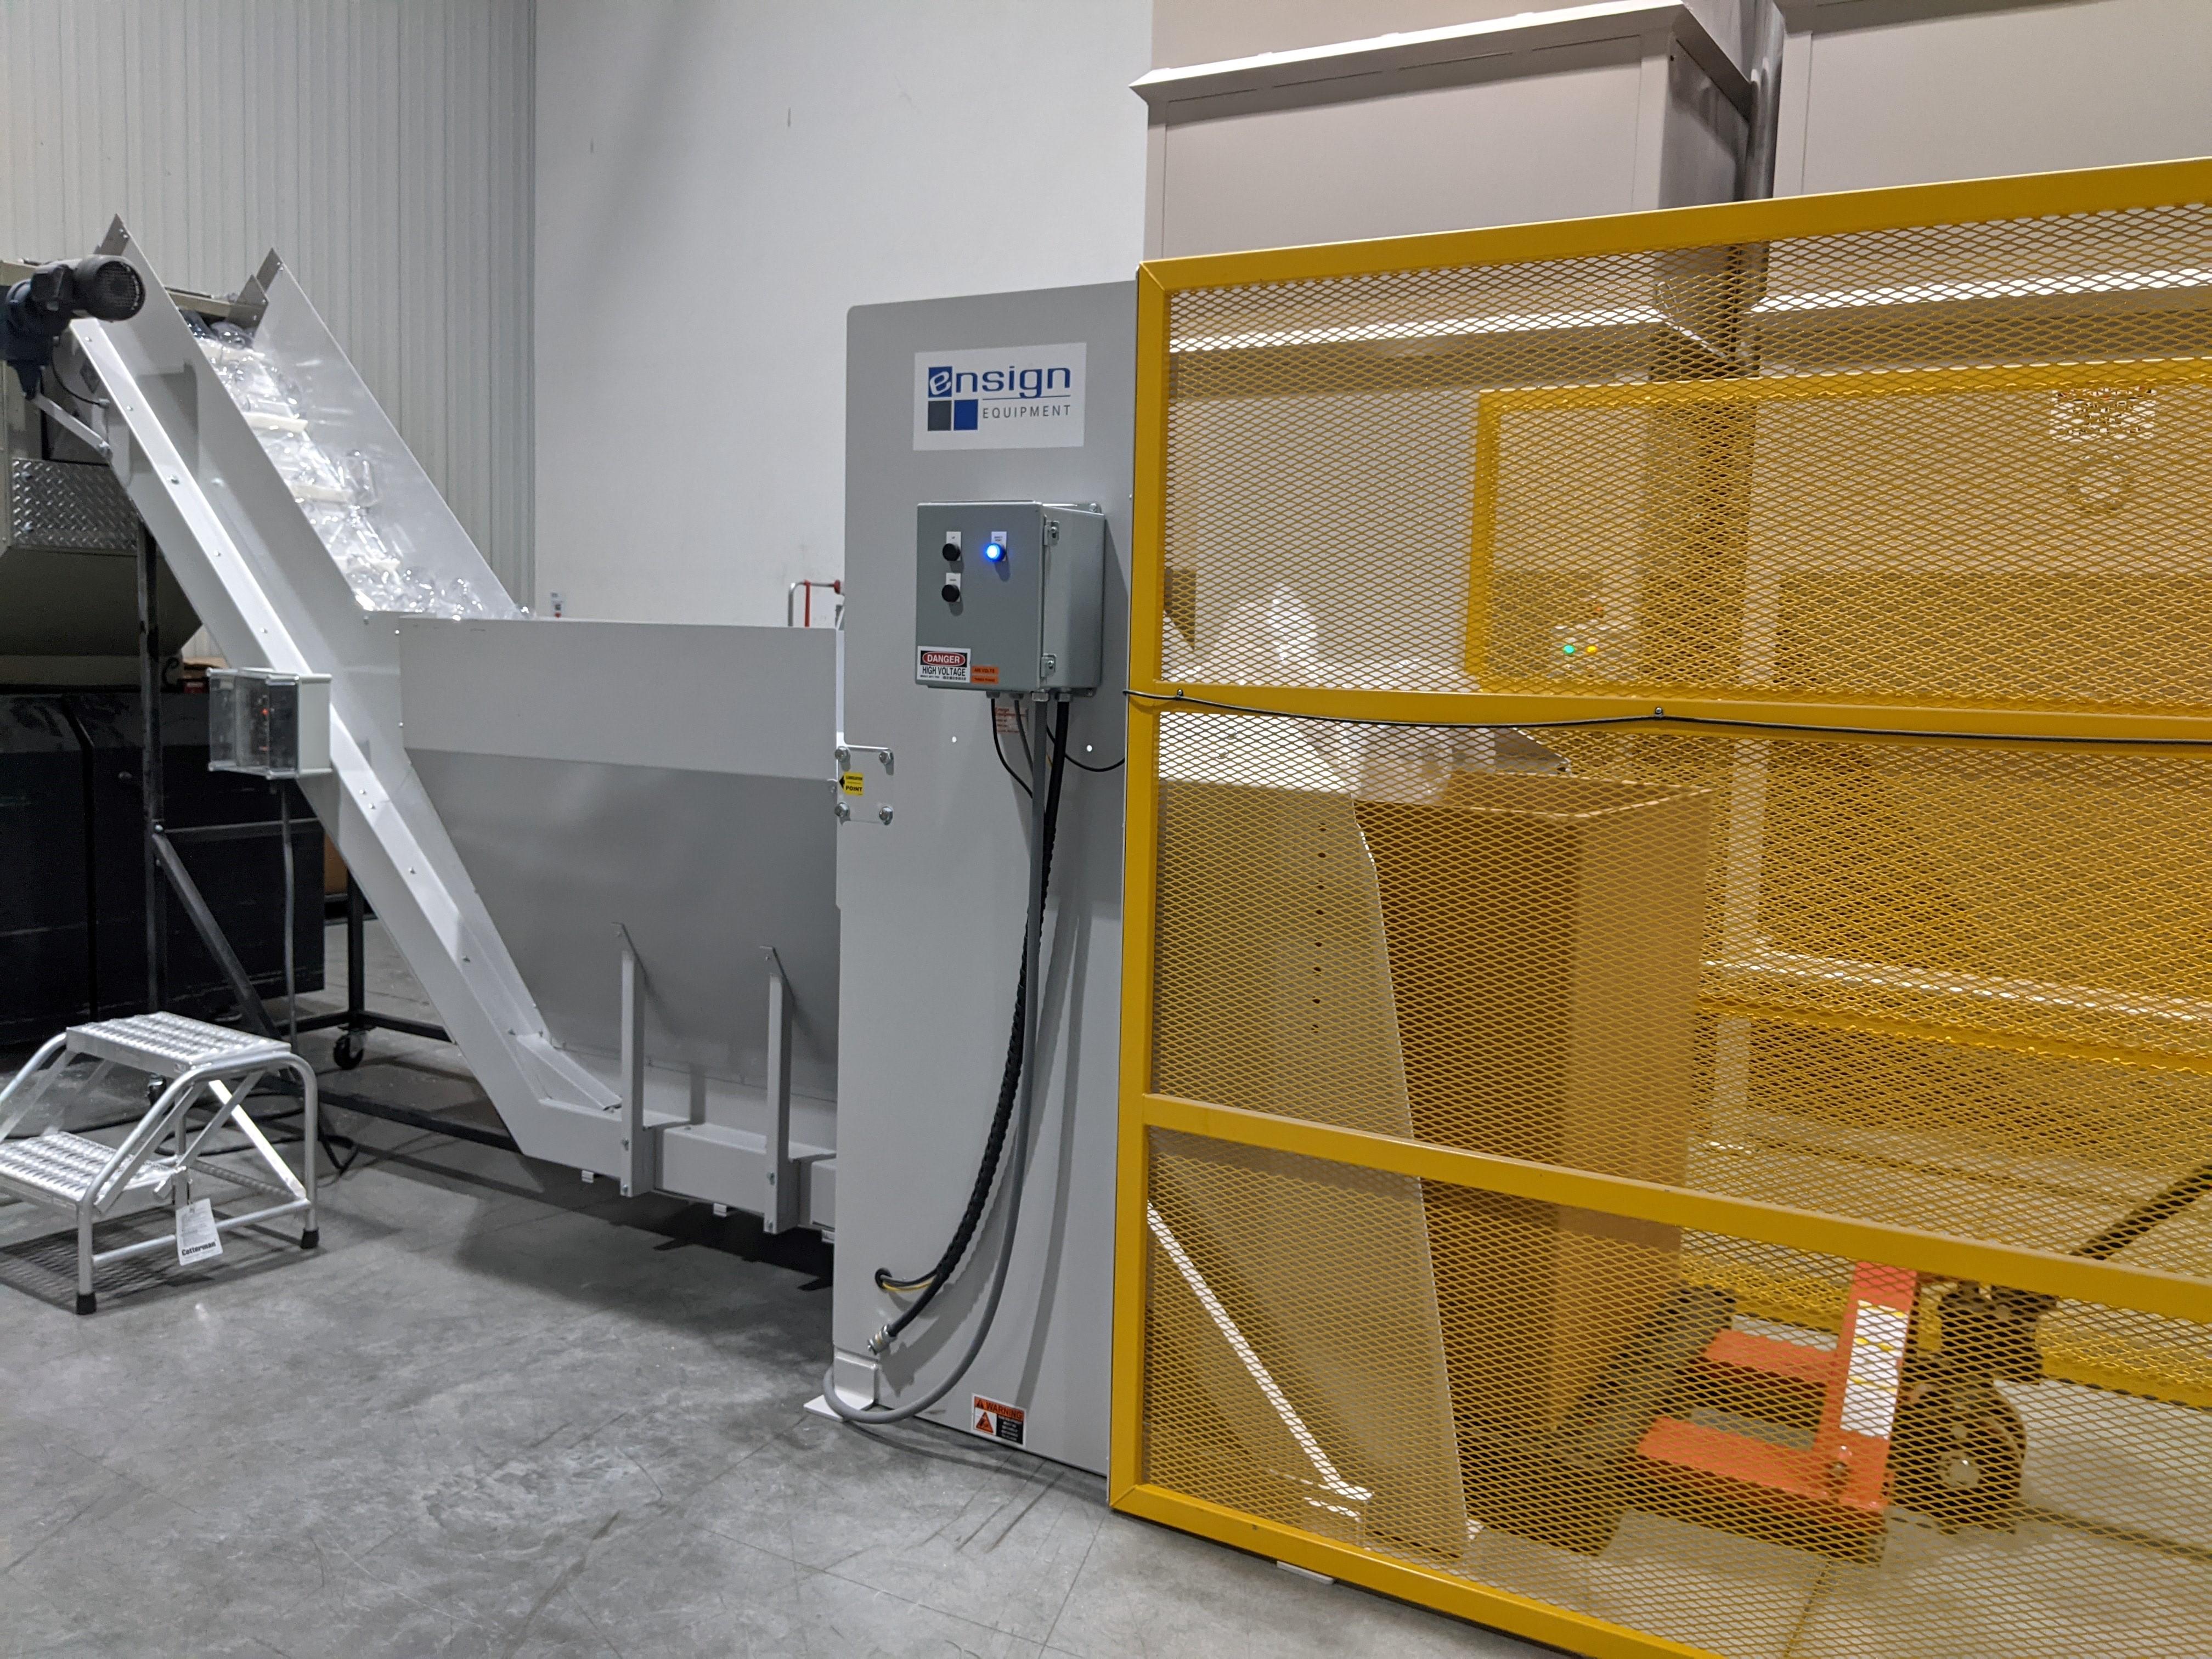 dumper conveyor systems